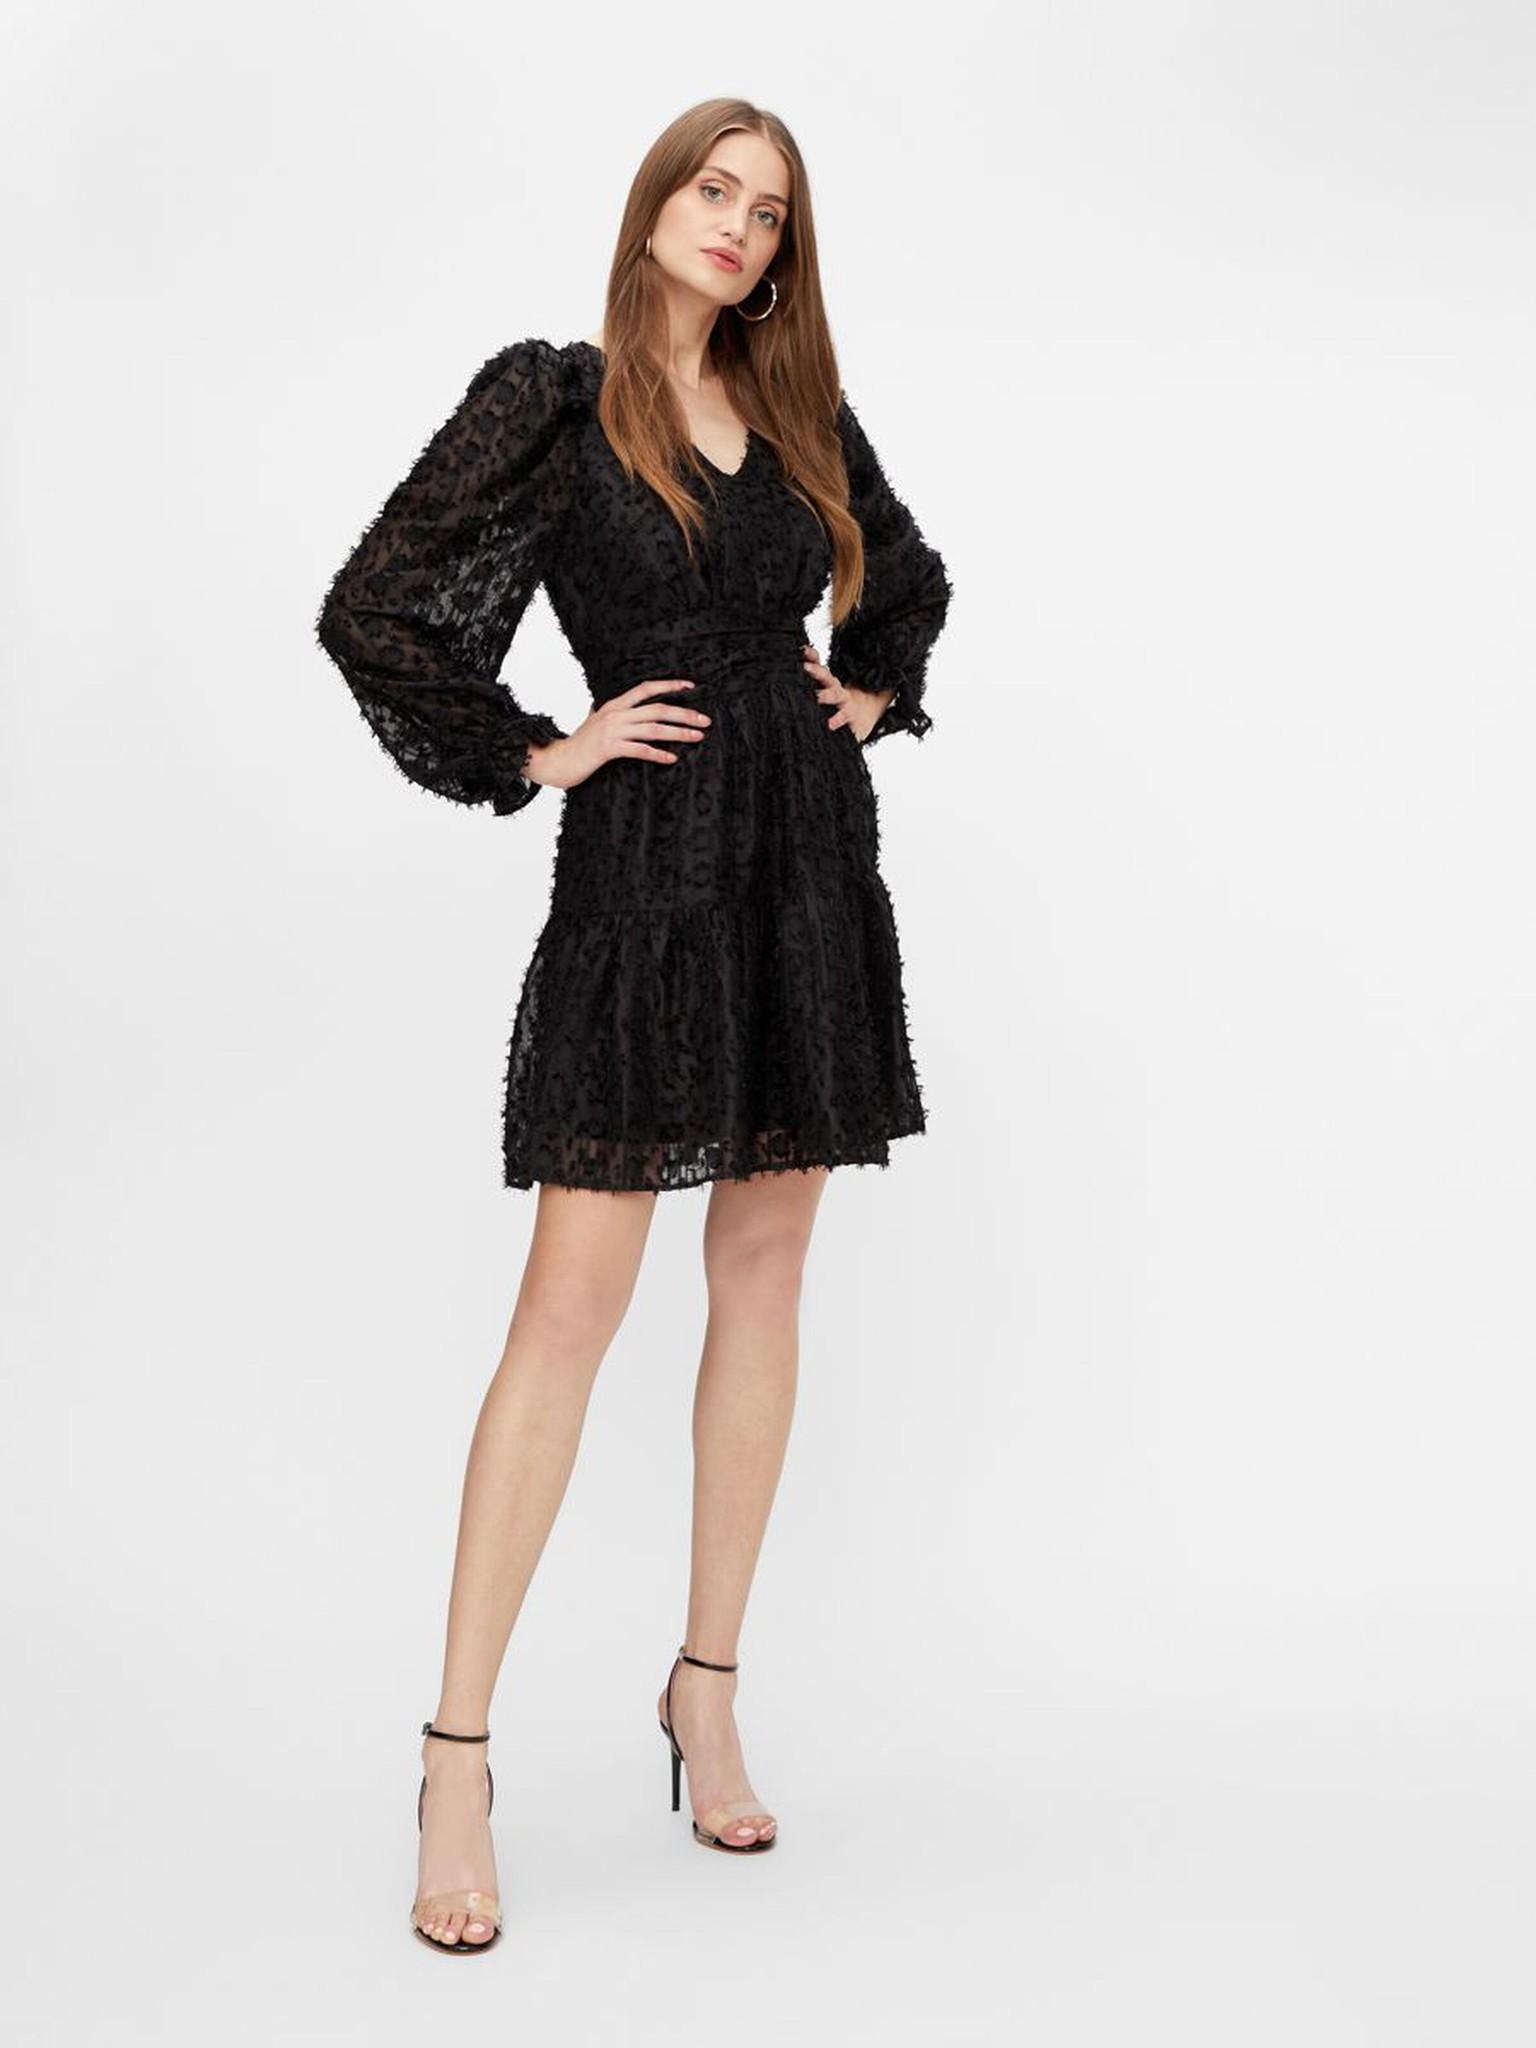 Jurk Vivian dress black-2